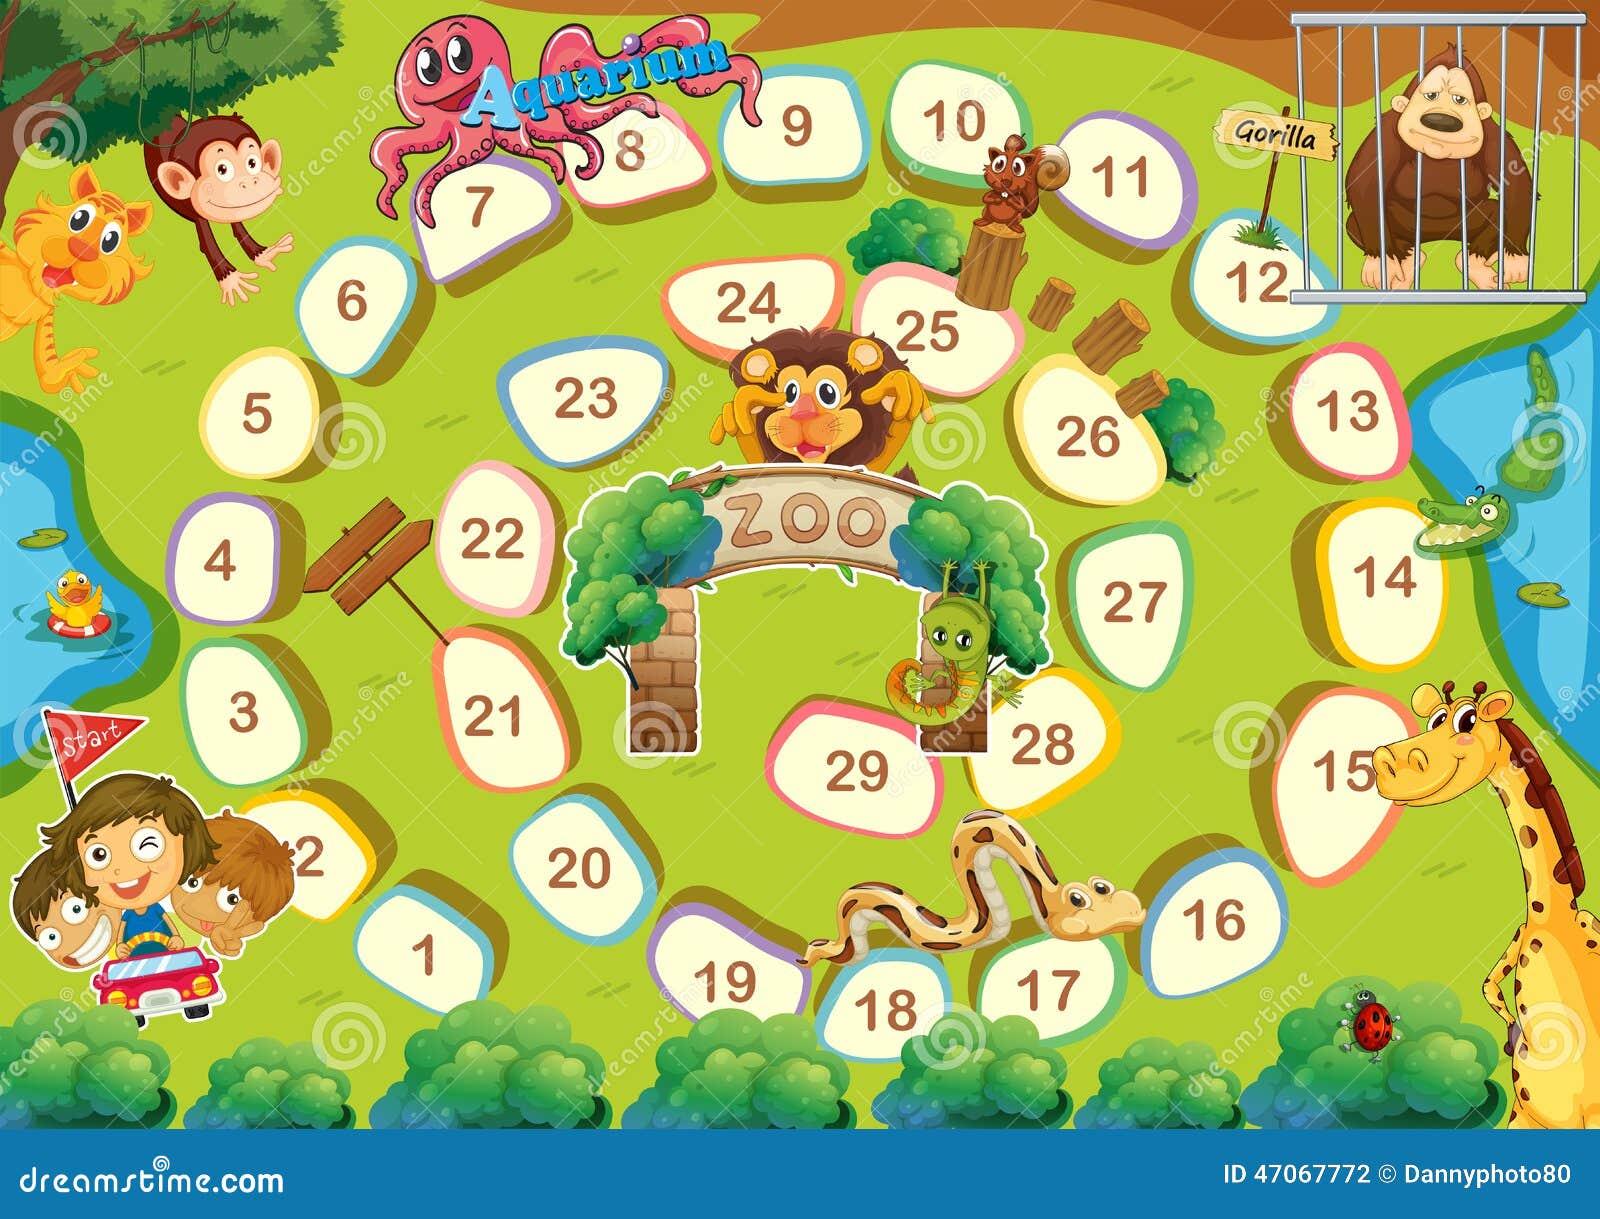 Zoo Theme Boardgame Stock Vector - Image: 47067772